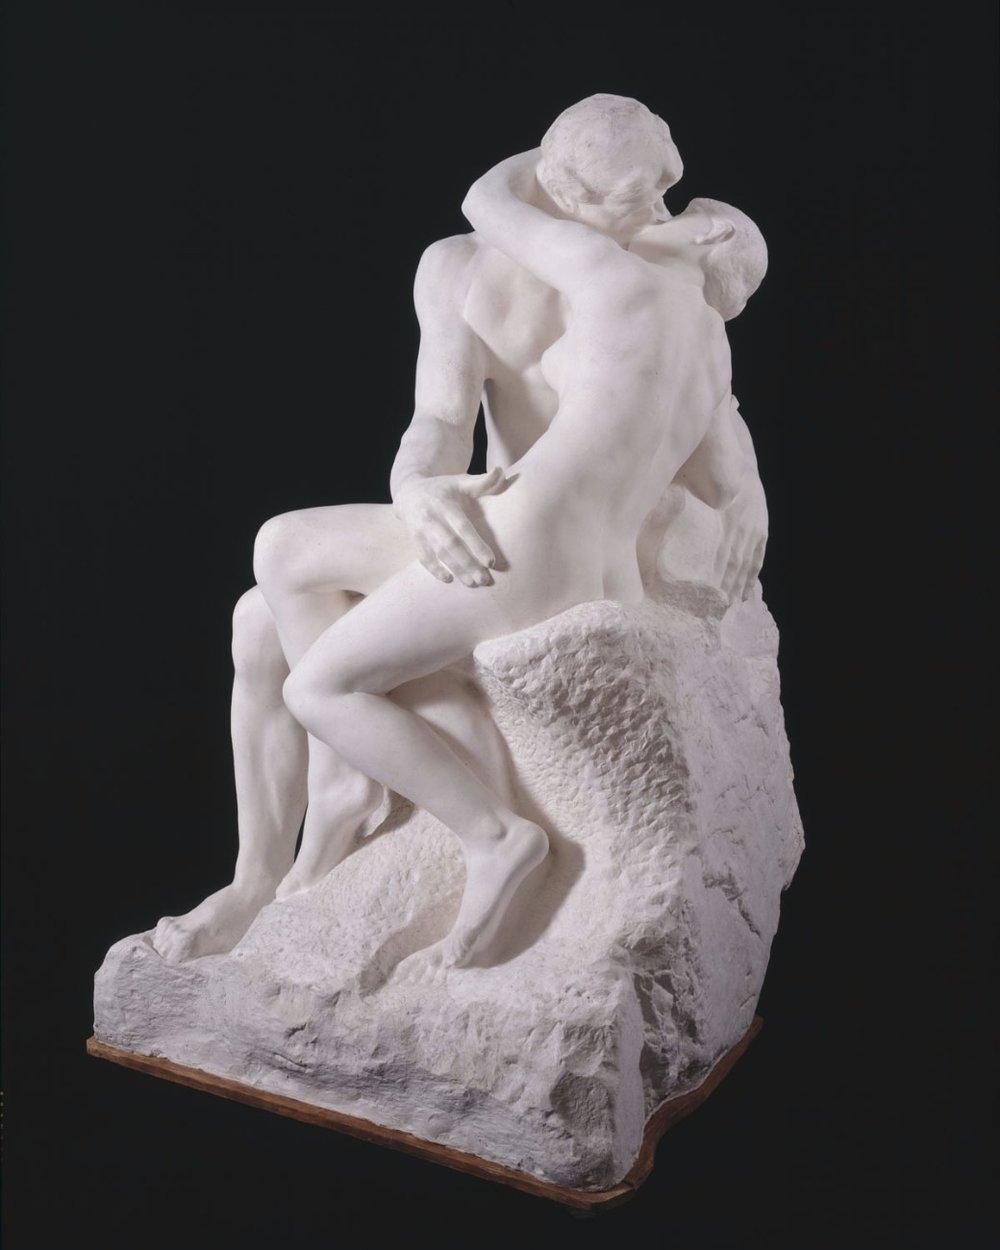 auguste-rodin-le-baiser-grand-modele-1888-1898_platre-184-x-112-x-110-cm--musee-rodin-paris-photo-adam-rzepka.jpg